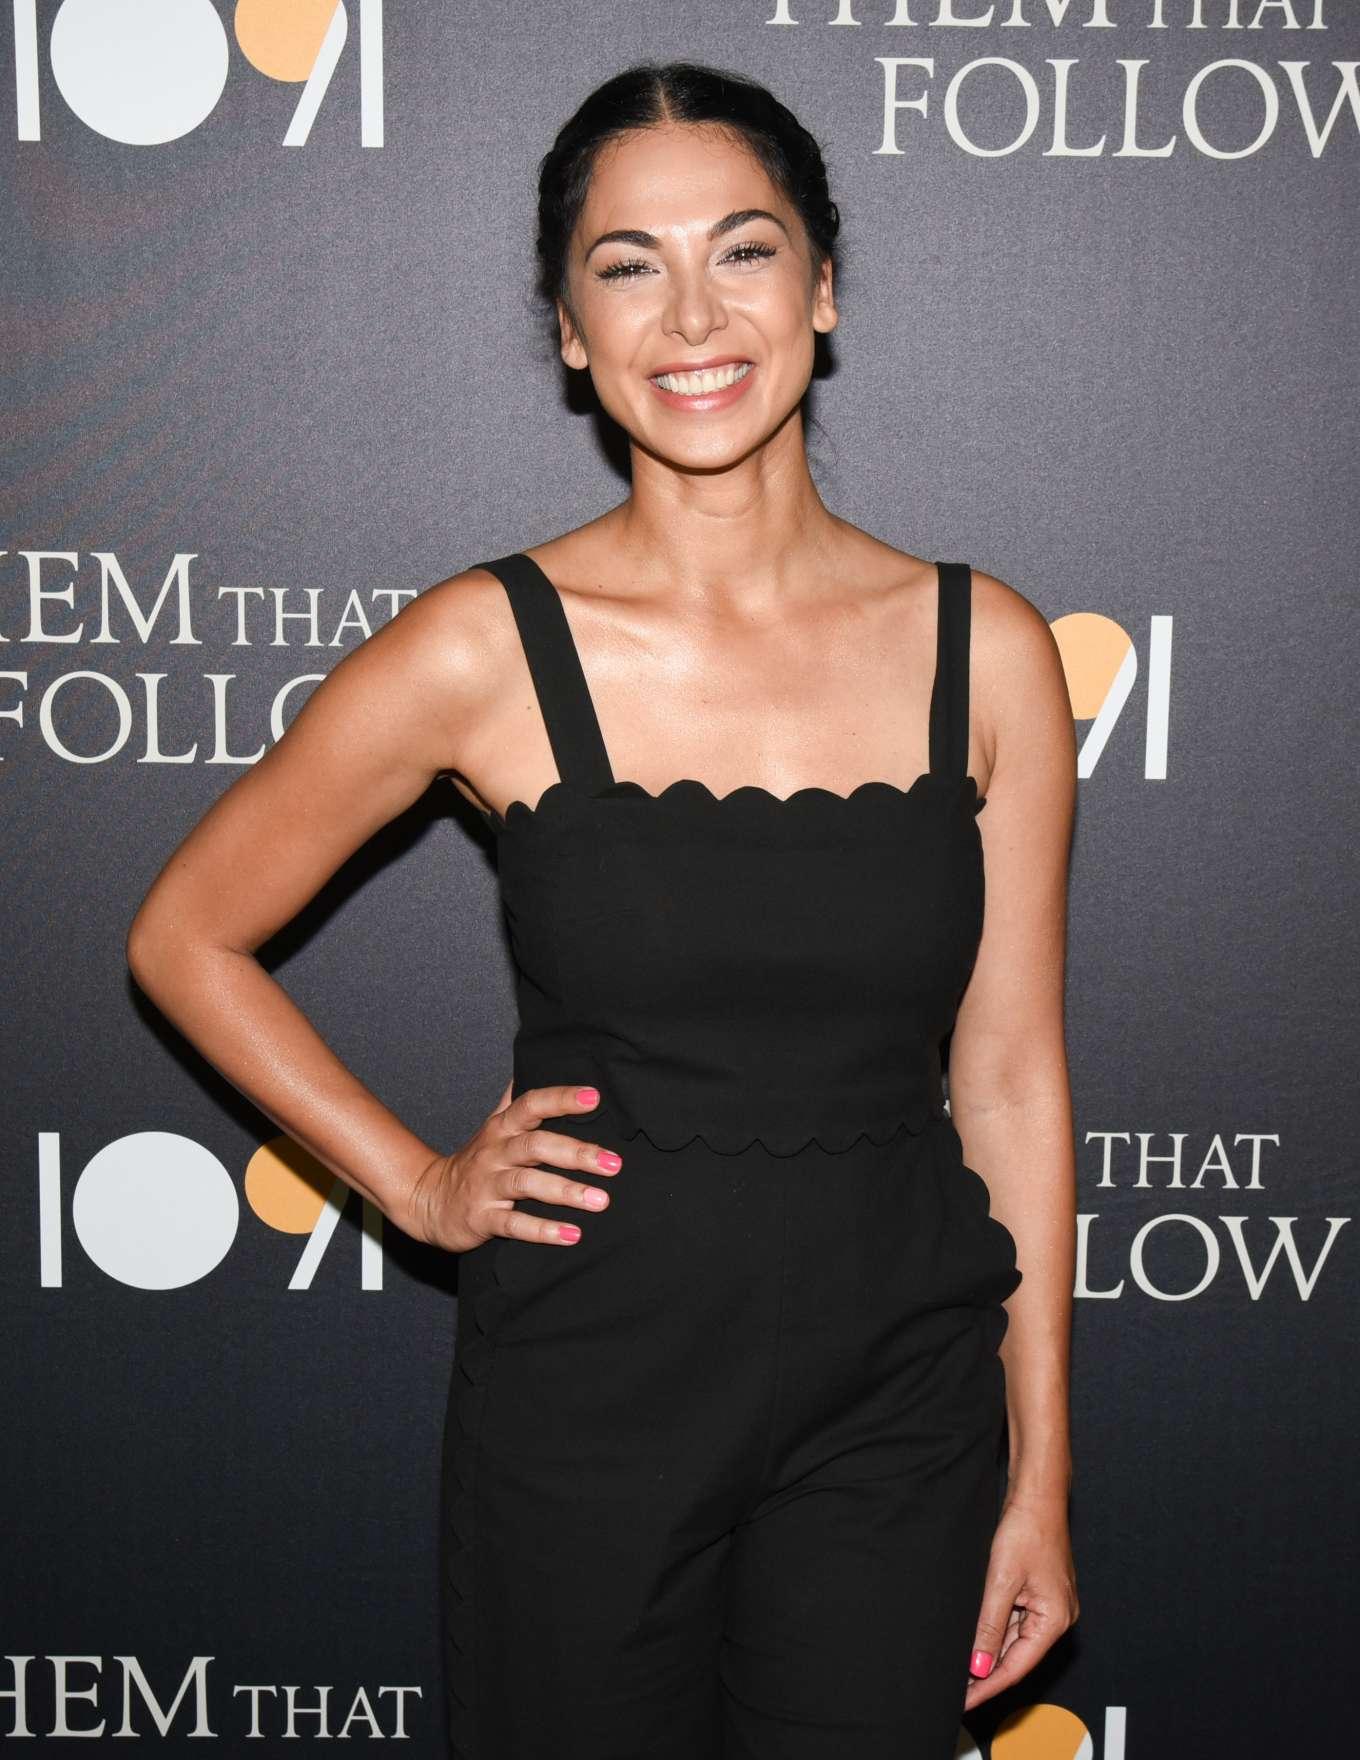 Moran Atias - 'Them That Follow' Premiere in Los Angeles